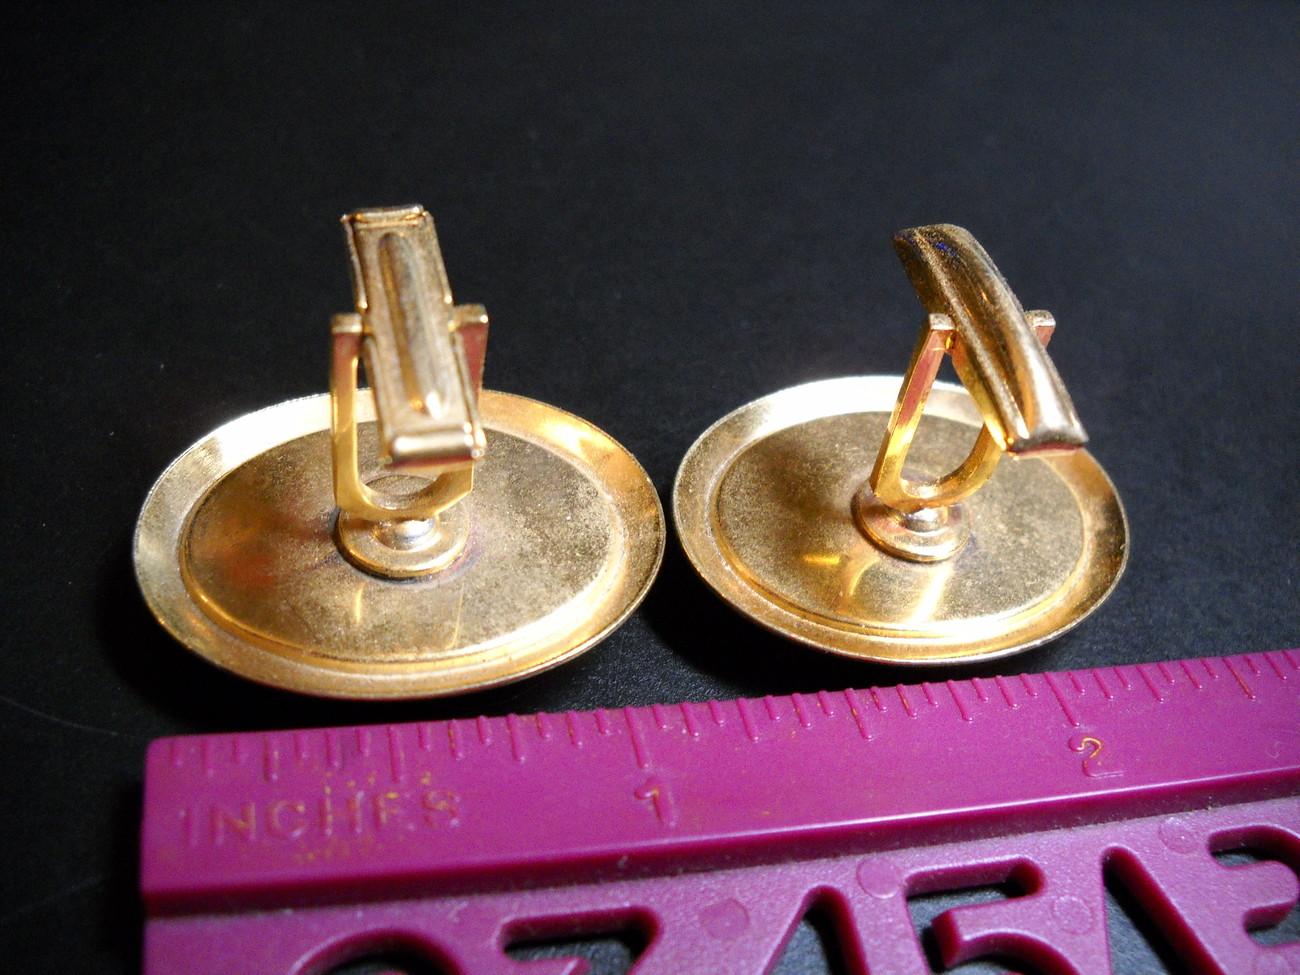 Cuff Links Hand Painted Pheasants under Glass Golden Ovals No Presentation Box